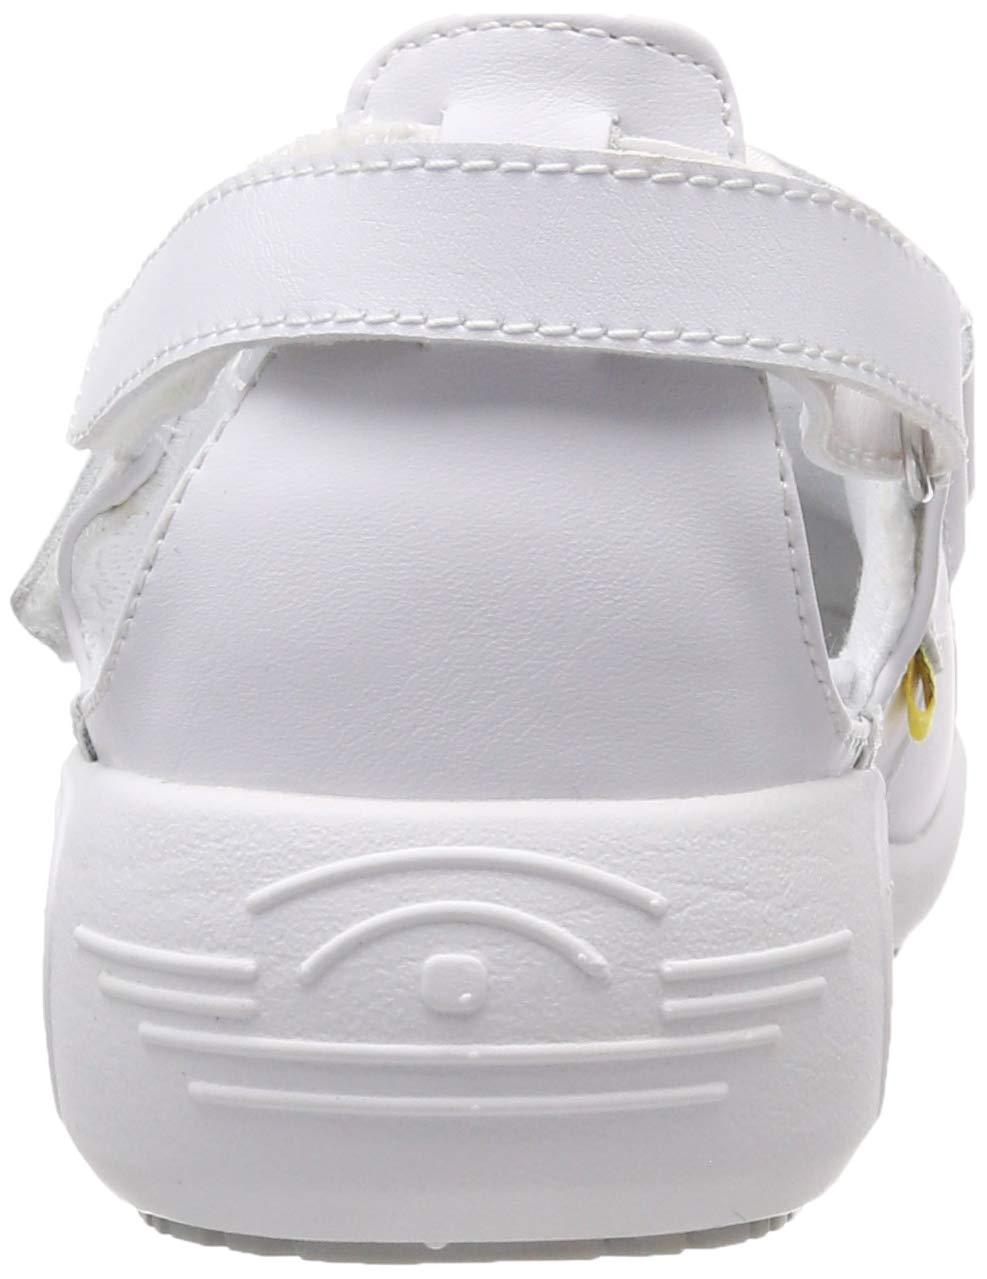 4 UK Antistatic Nursing Shoes 37 EU Oxypas Move Up Salma Slip-resistant Fuchsia White//Fuchsia